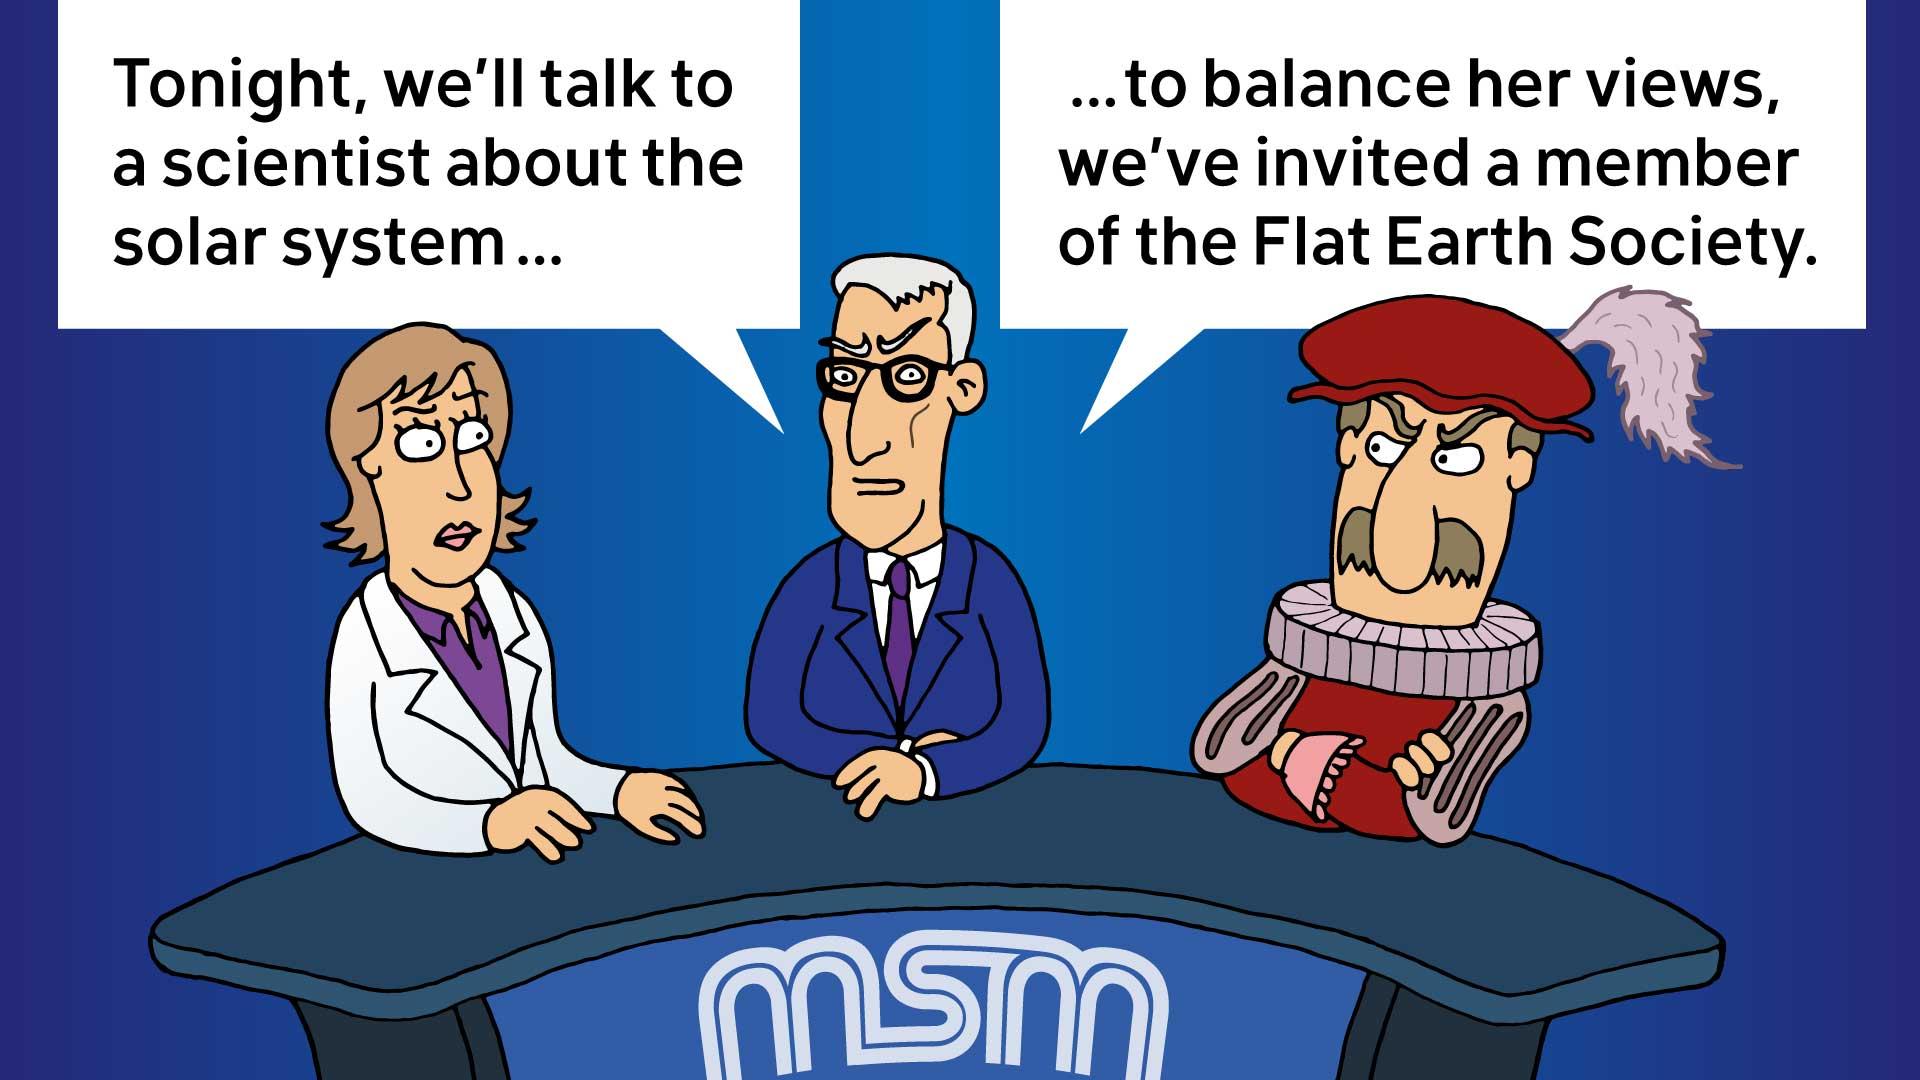 Mainstream media coverage